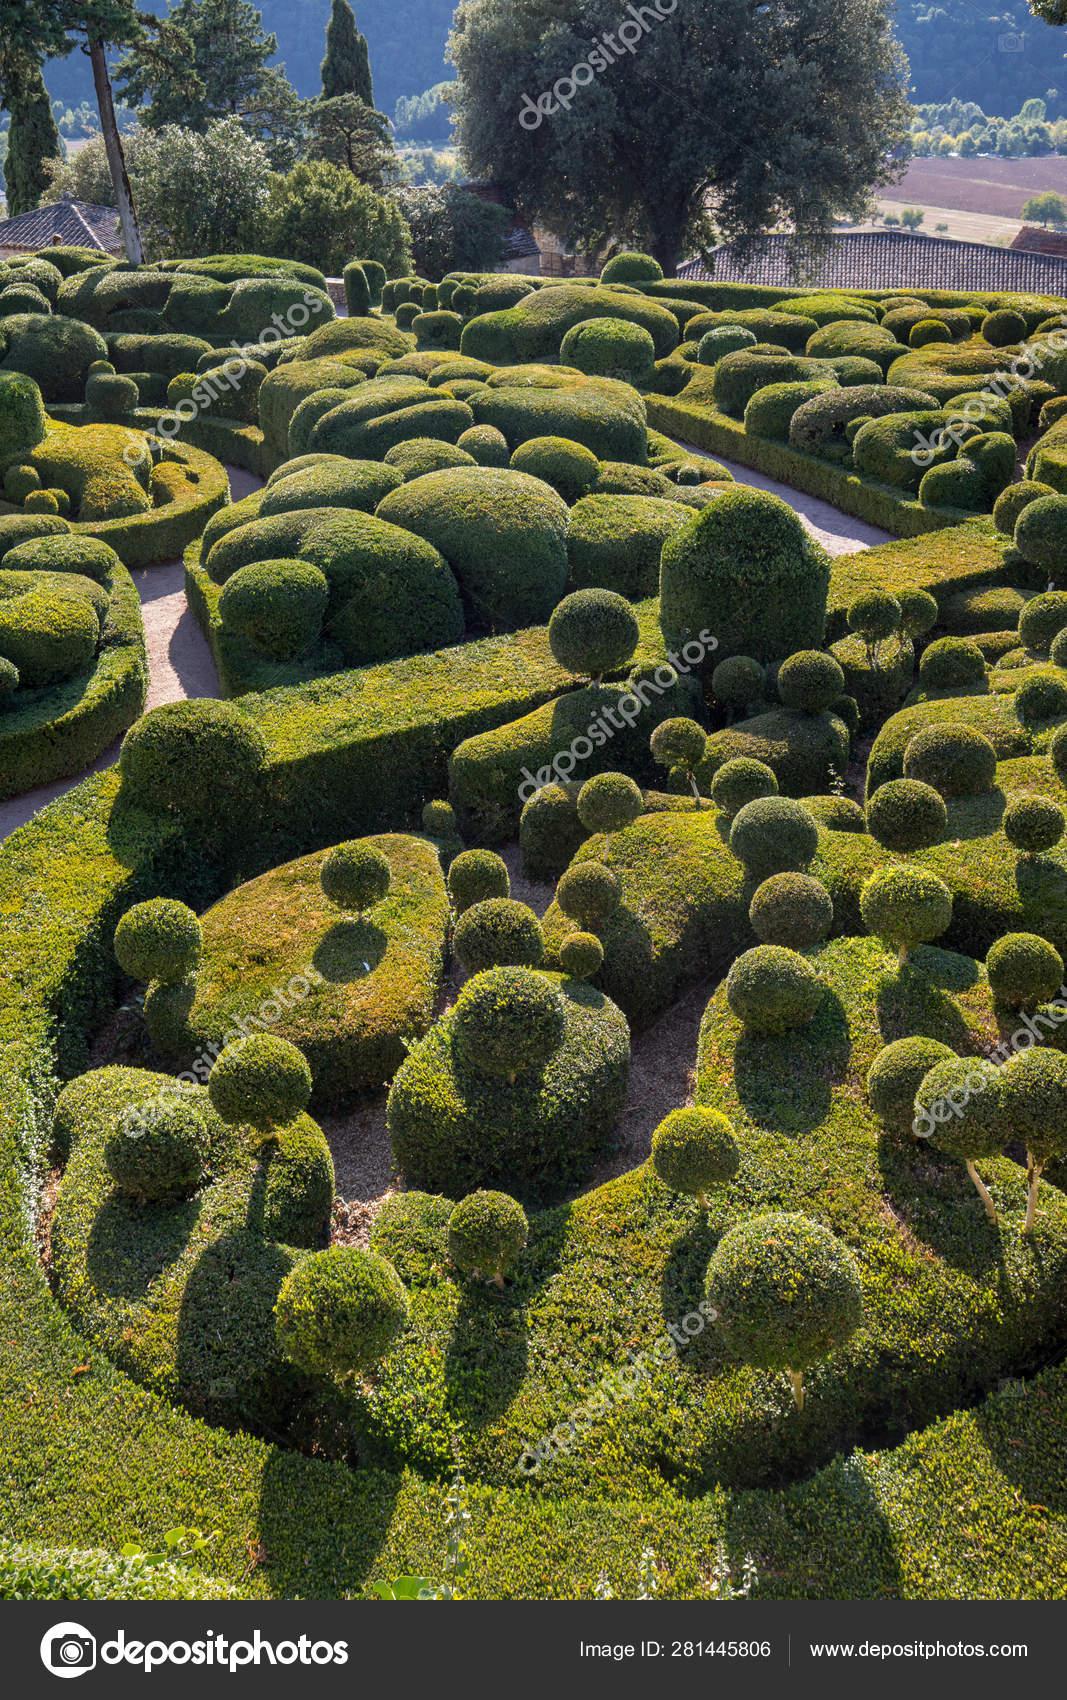 Dordogne France September 2018 Topiary Gardens Jardins tout Region De France 2018